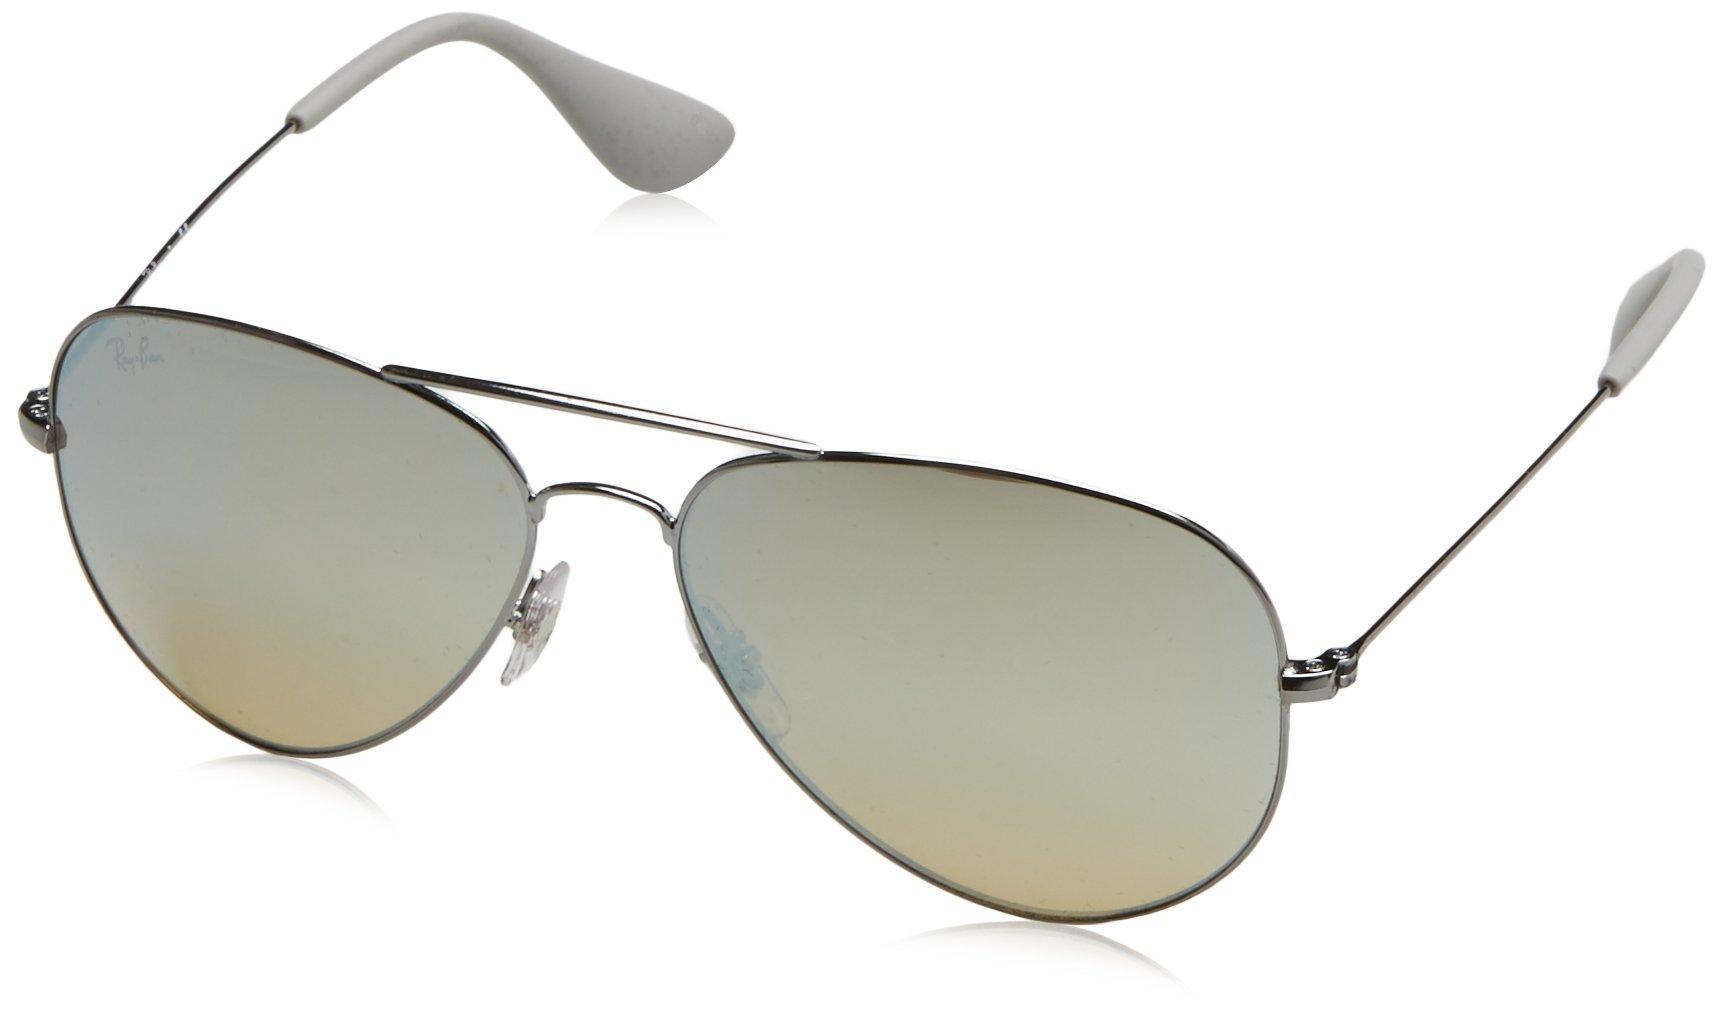 Ray-Ban Metal Unisex Aviator Sunglasses, Gunmetal, 58 mm